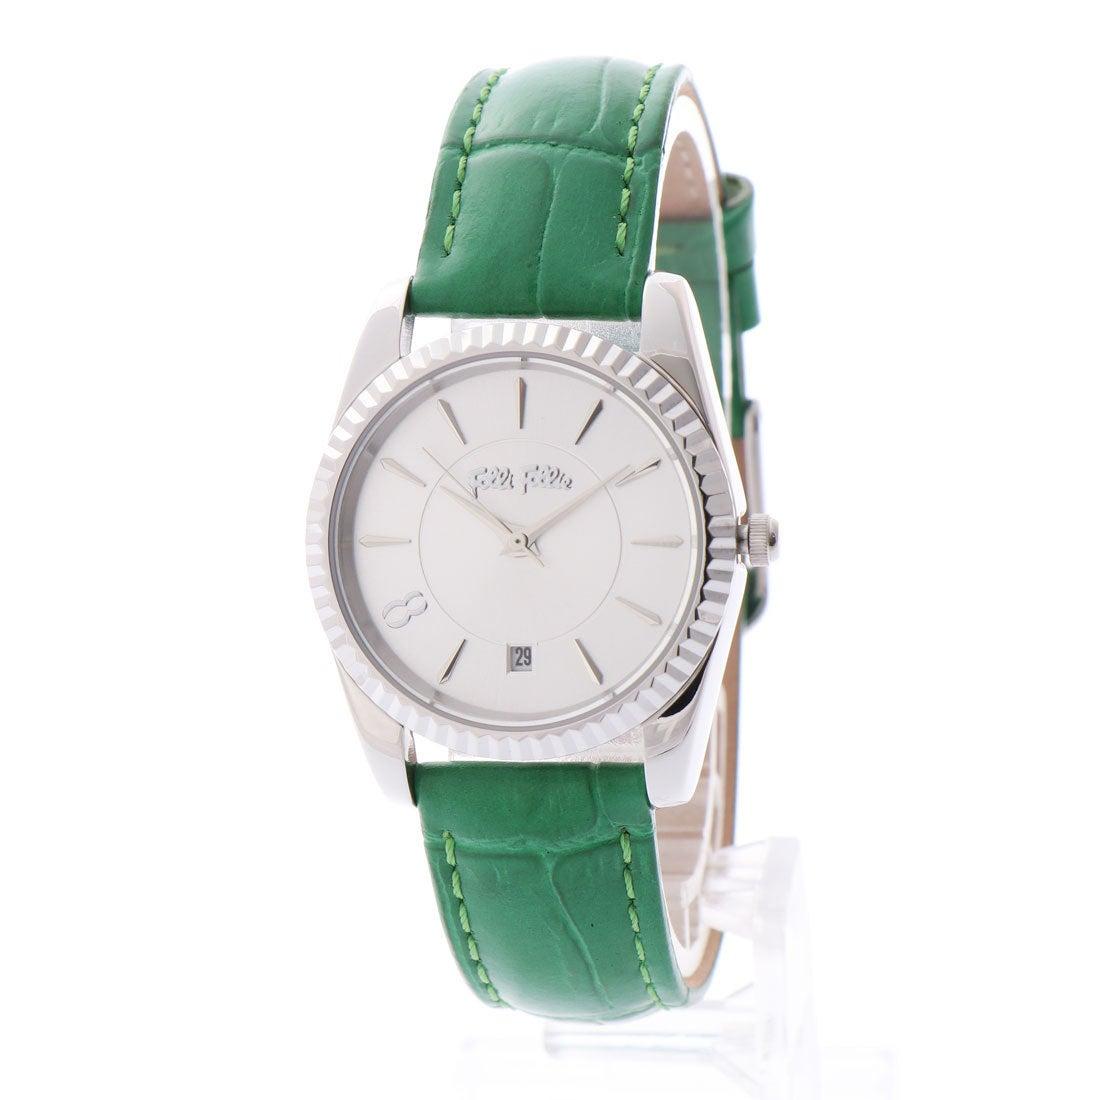 7844e84314 フォリフォリ Folli Follie CHRONOS TALES レザーベルトウォッチ/腕時計 (グリーン) -靴&ファッション通販  ロコンド〜自宅で試着、気軽に返品